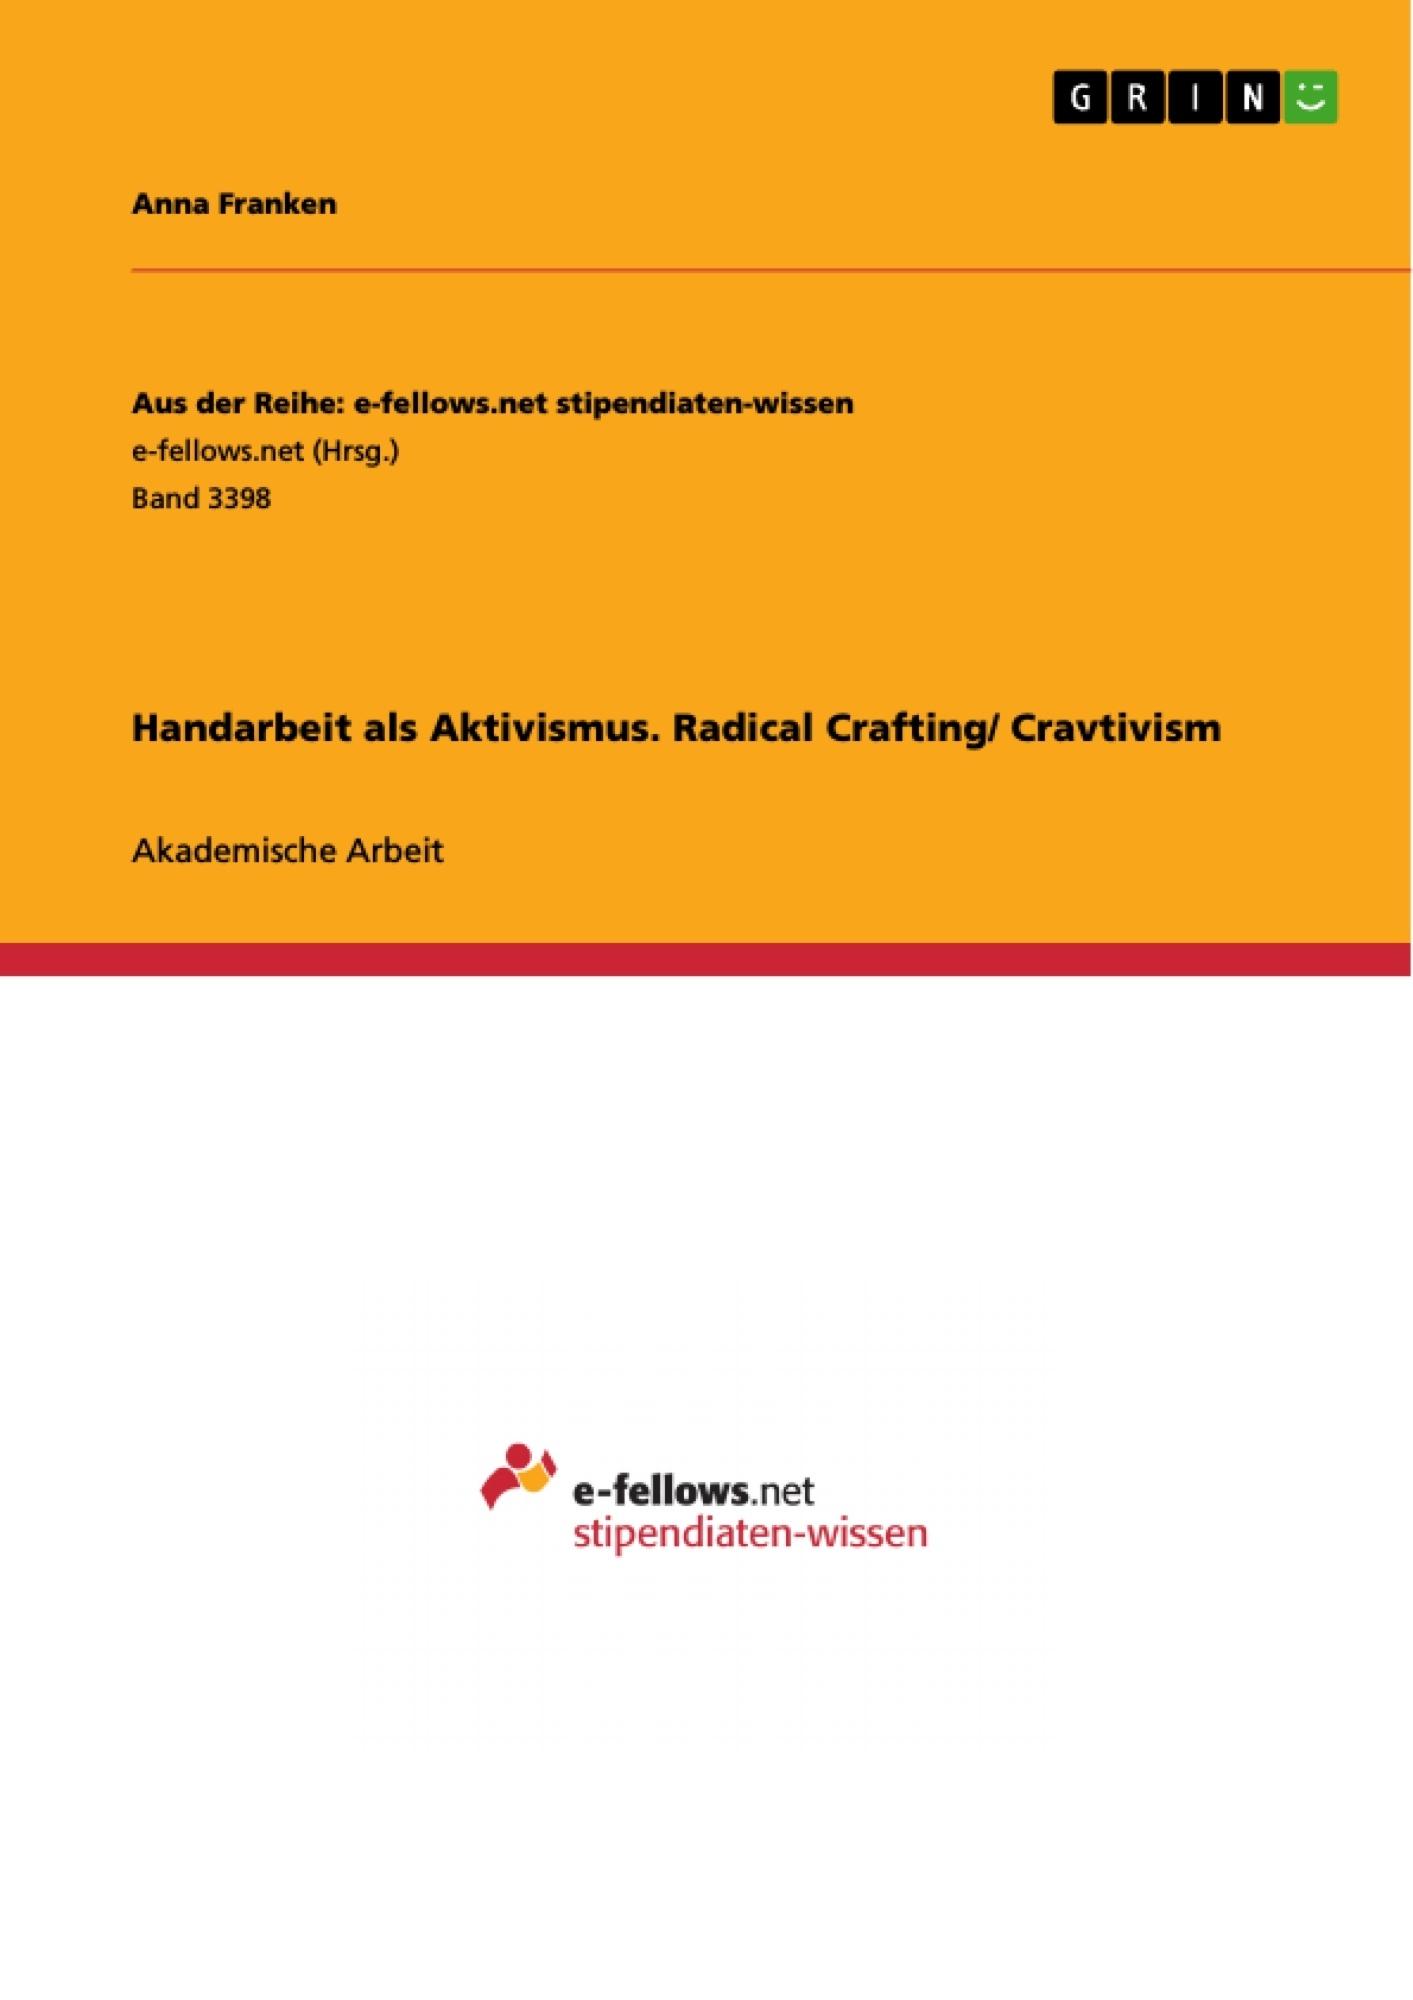 Titel: Handarbeit als Aktivismus. Radical Crafting/ Cravtivism